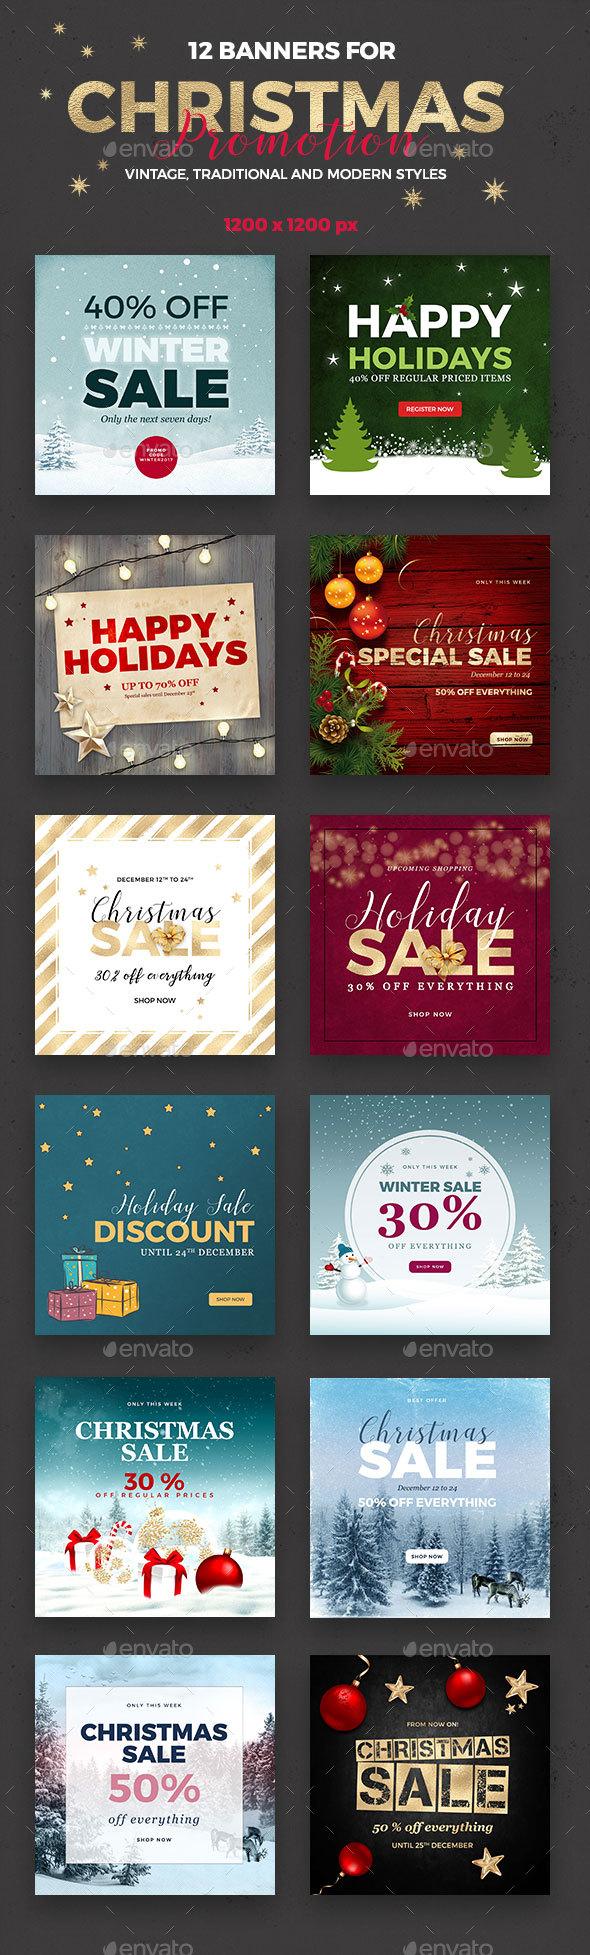 12 Christmas Banner - Social Media Web Elements